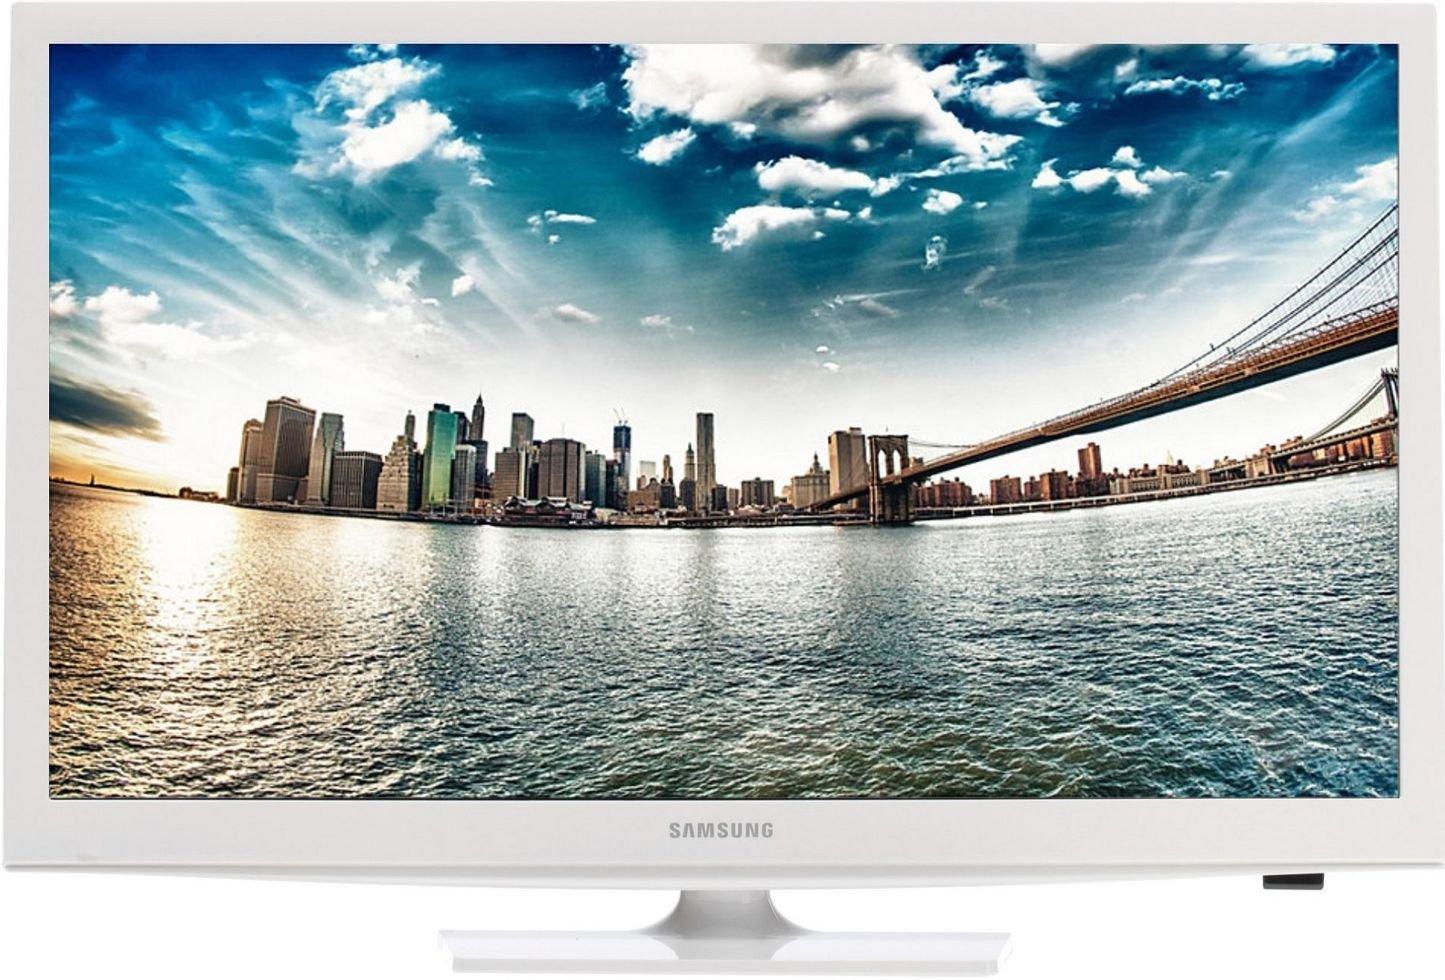 купить телевизор петербург